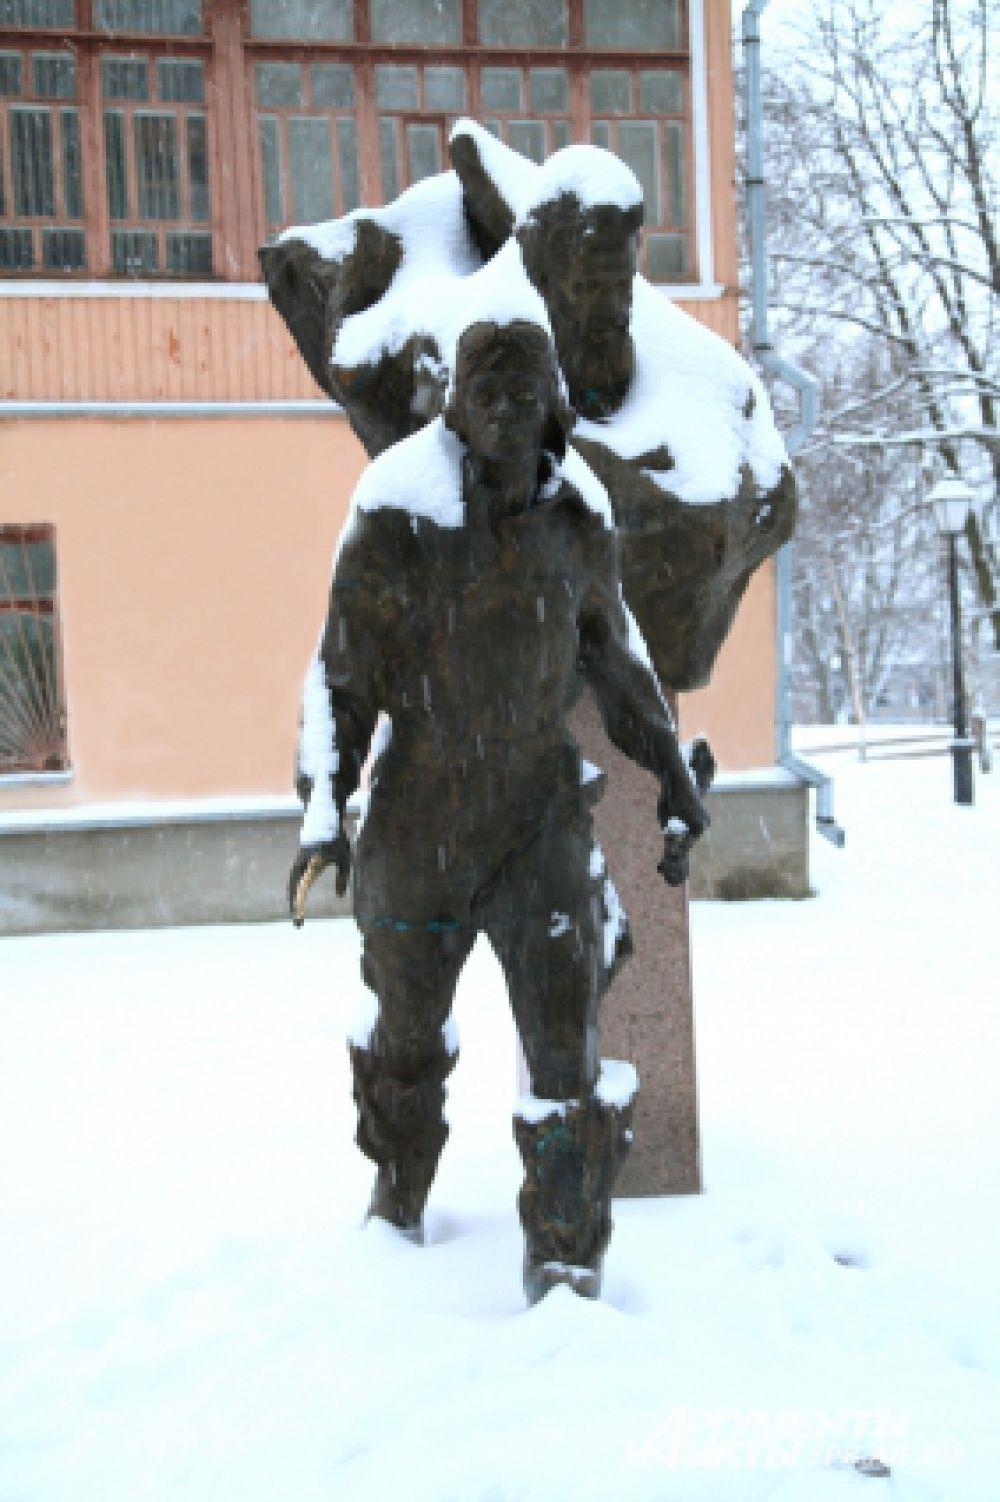 Памятник «Двум капитанам» открыли 20 лет назад